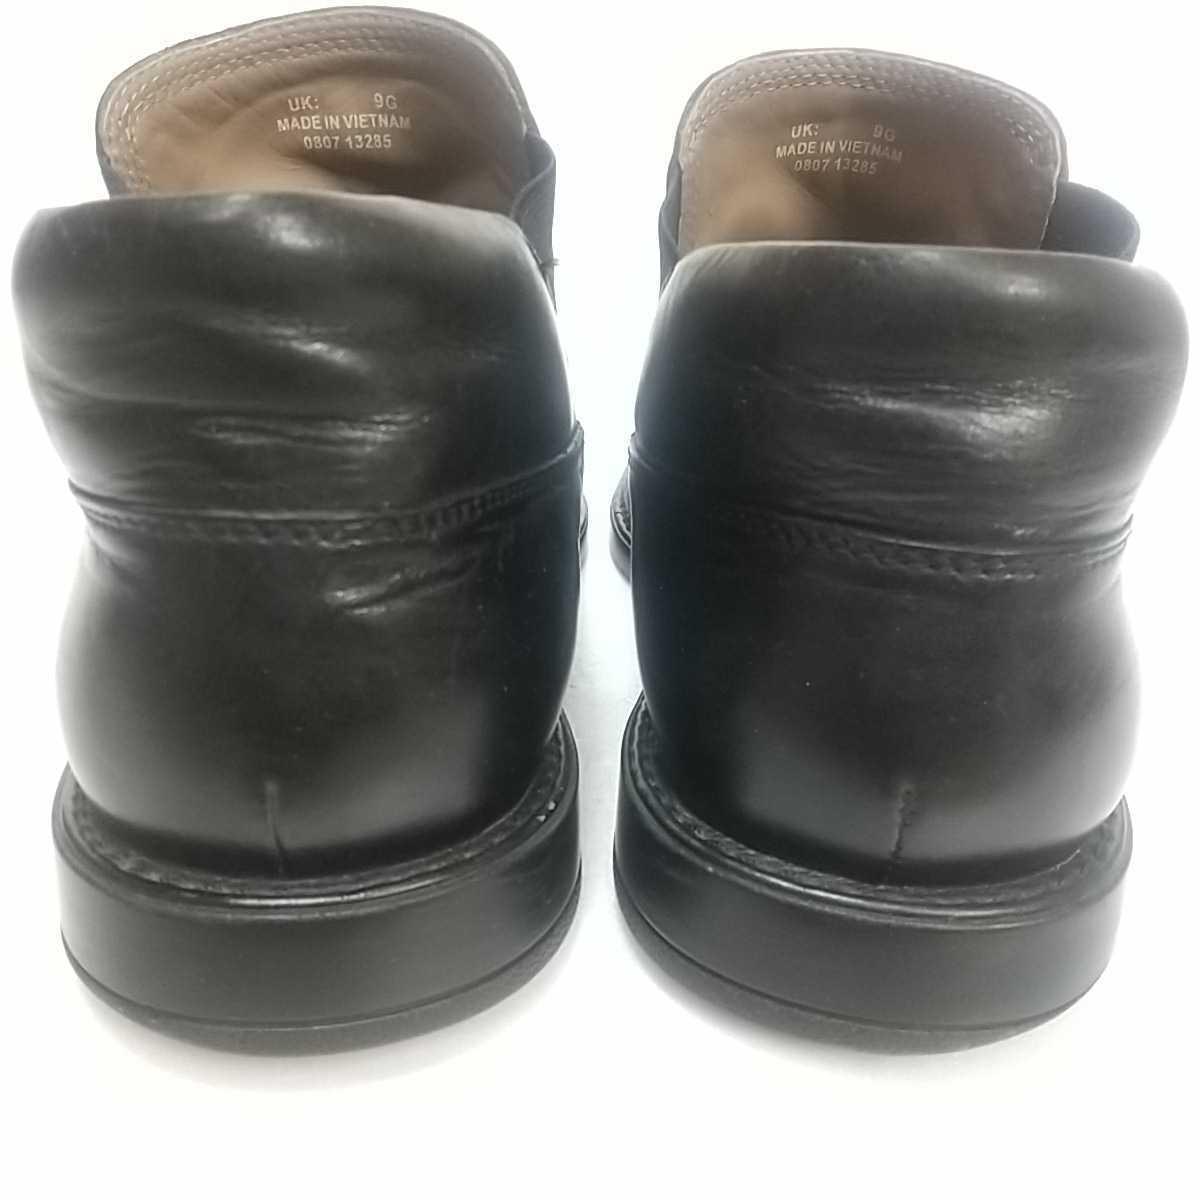 Clarks クラークス レザー サイドゴアブーツ ショート UK9 27.5cm 黒 ブラック 革靴 _画像7